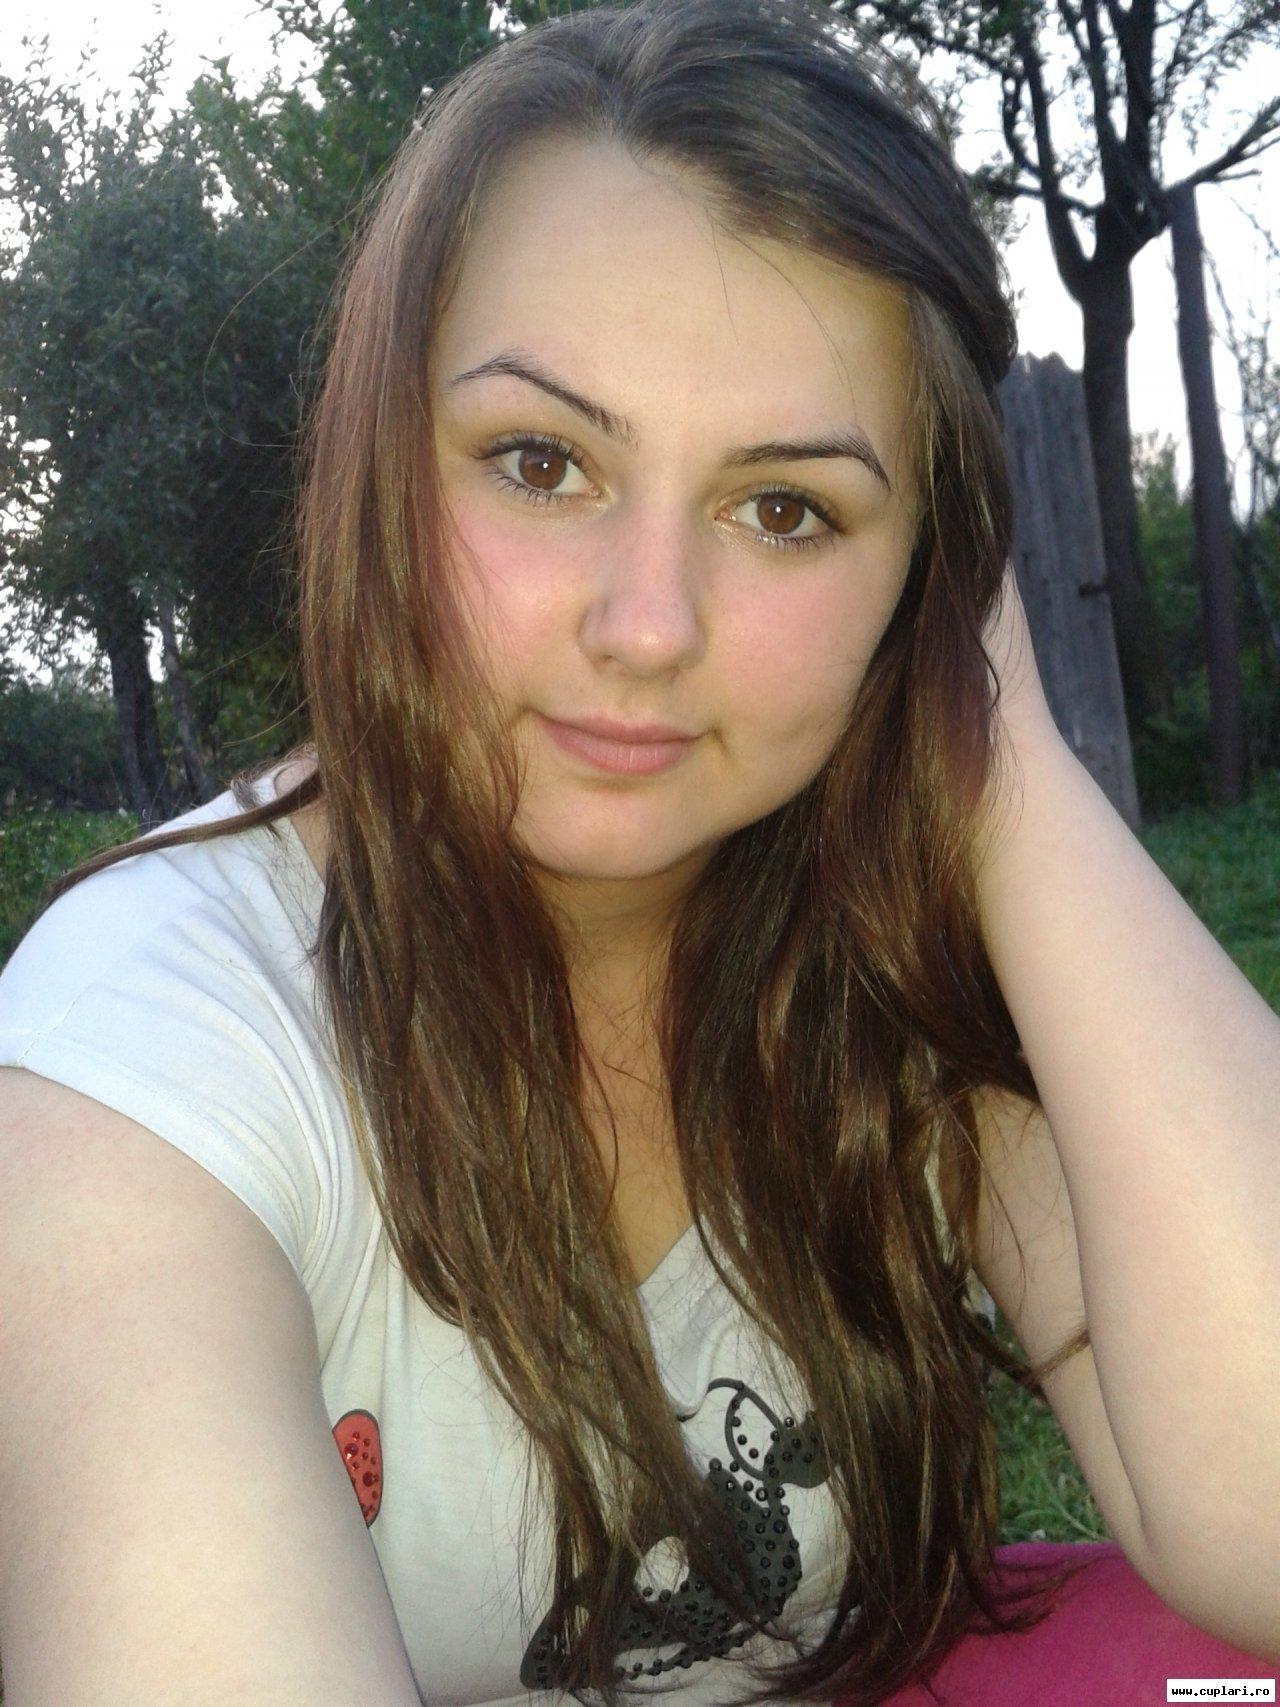 fete frumoase din Sibiu care cauta barbati din Timișoara caut amant rekovac